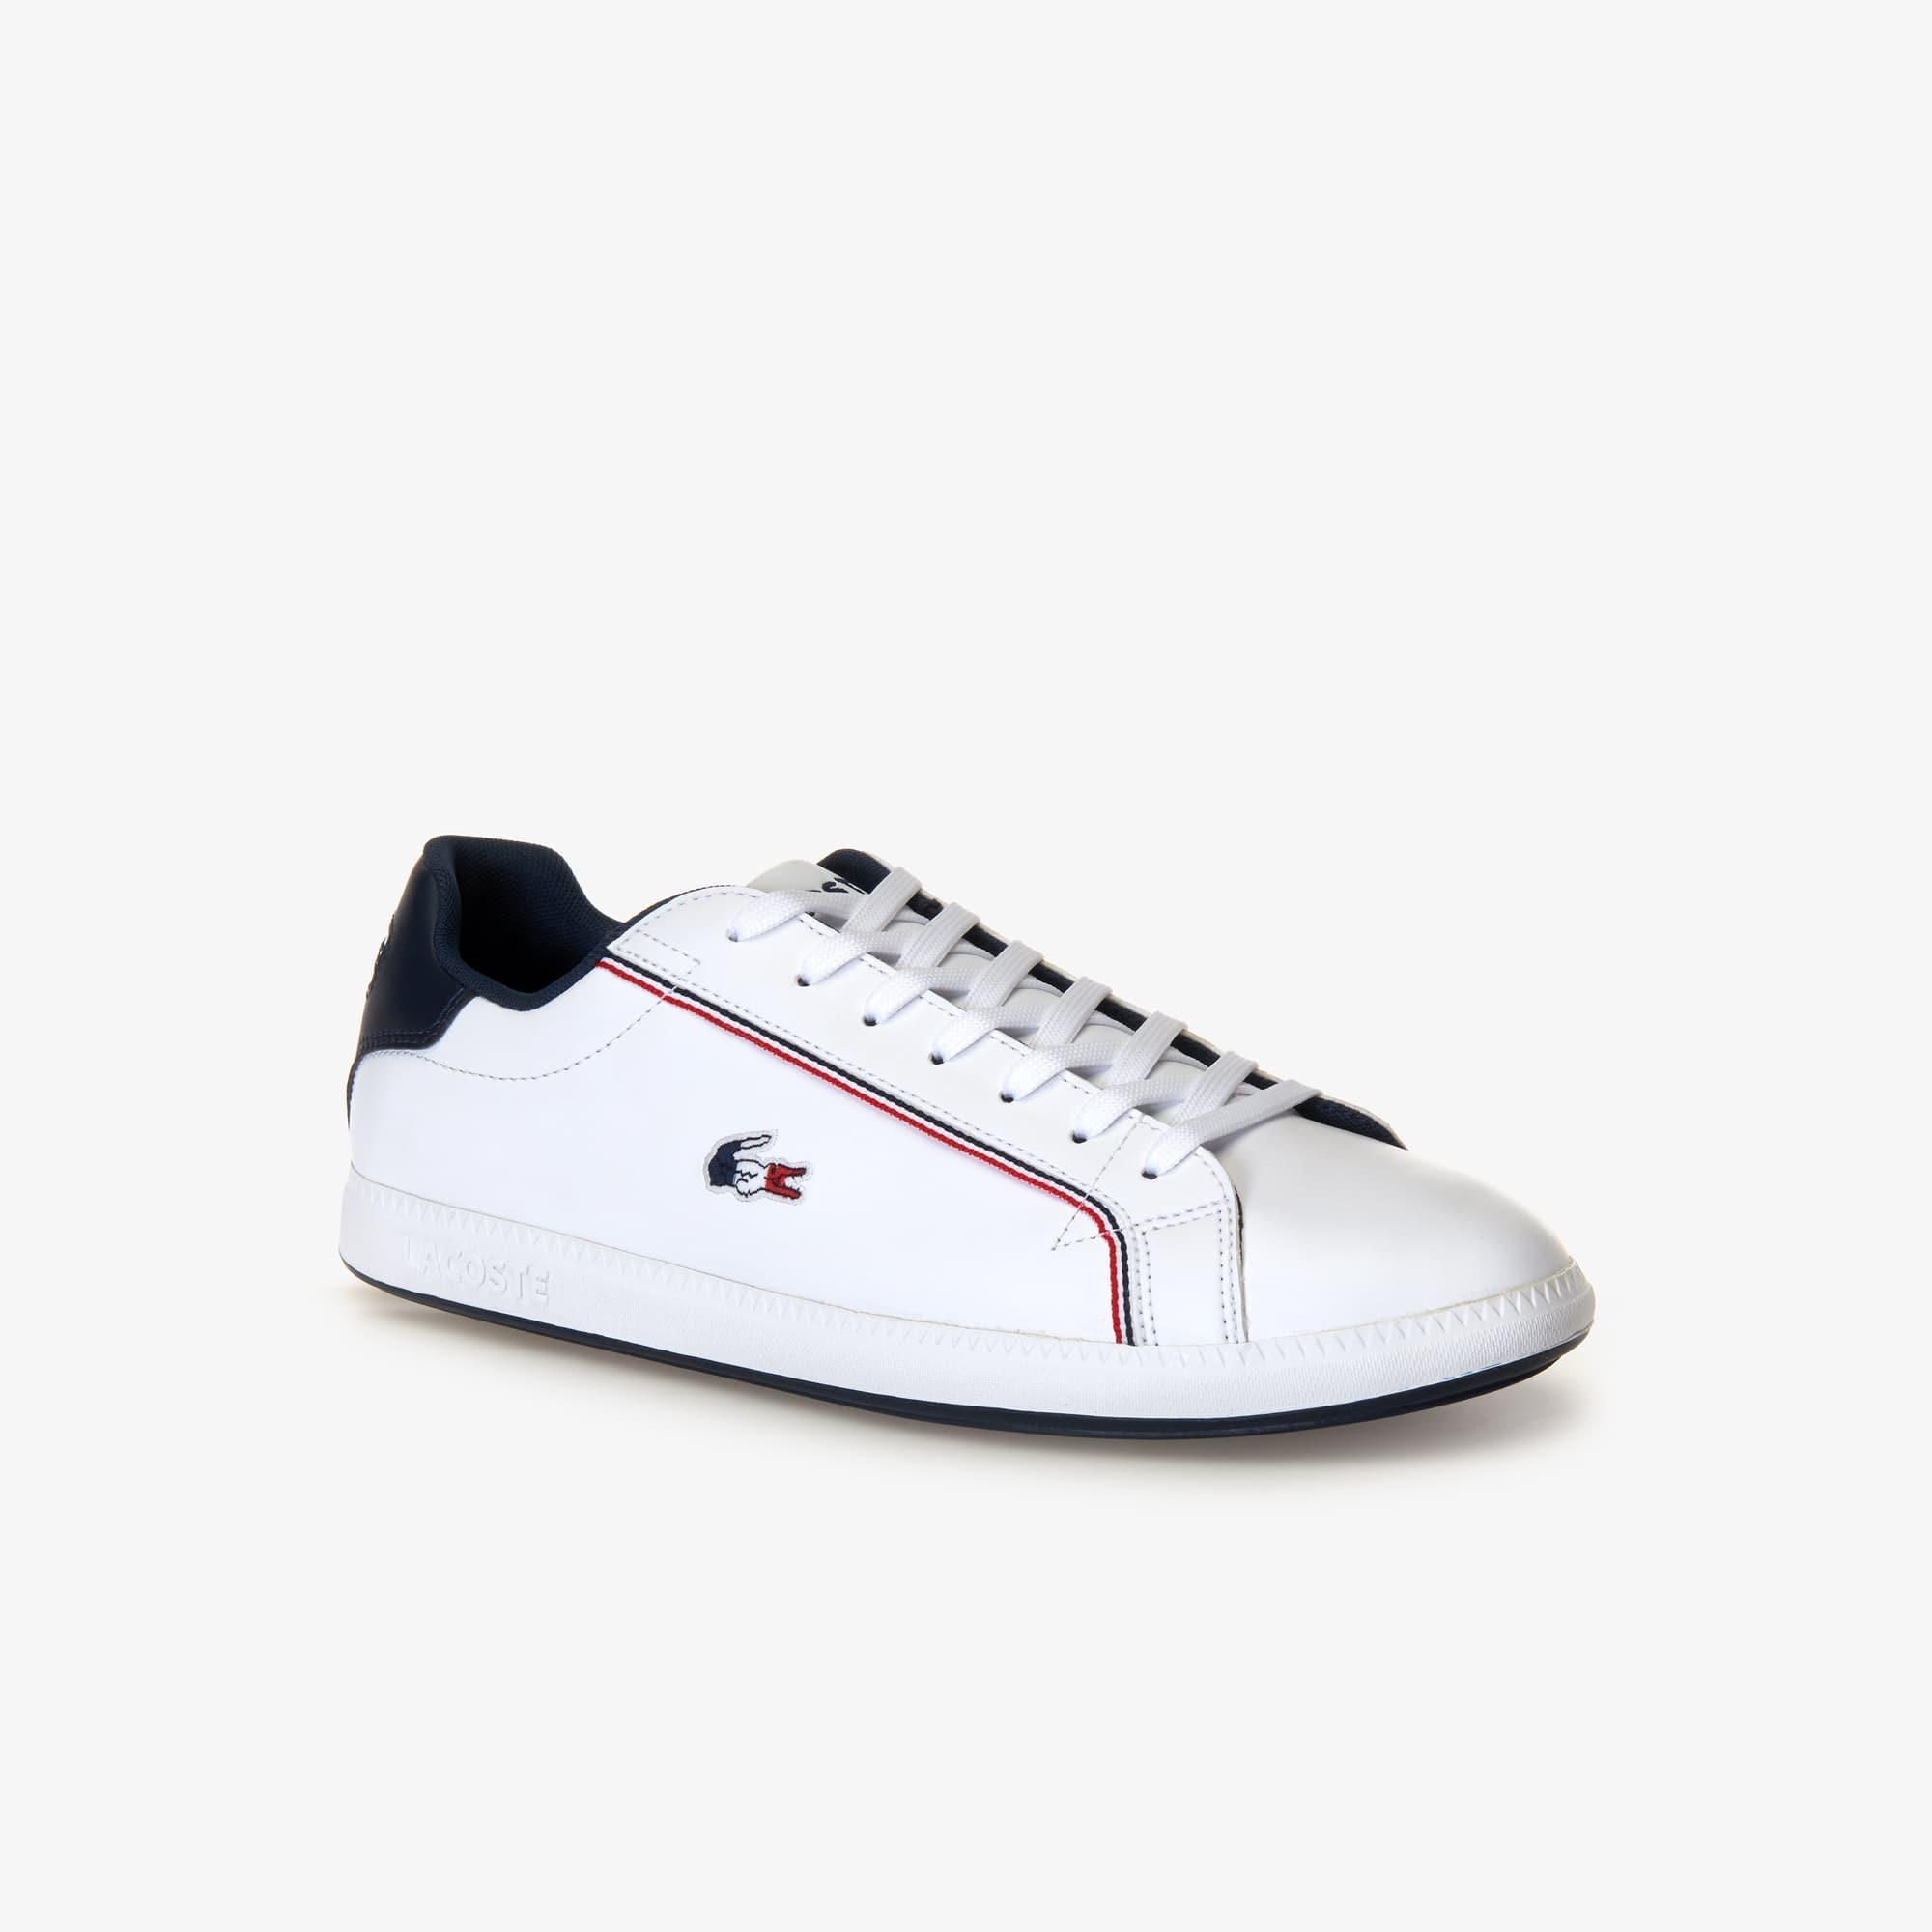 0b2c89cc8 + 1 color. New. Men s Graduate Leather Tricolore Sneakers